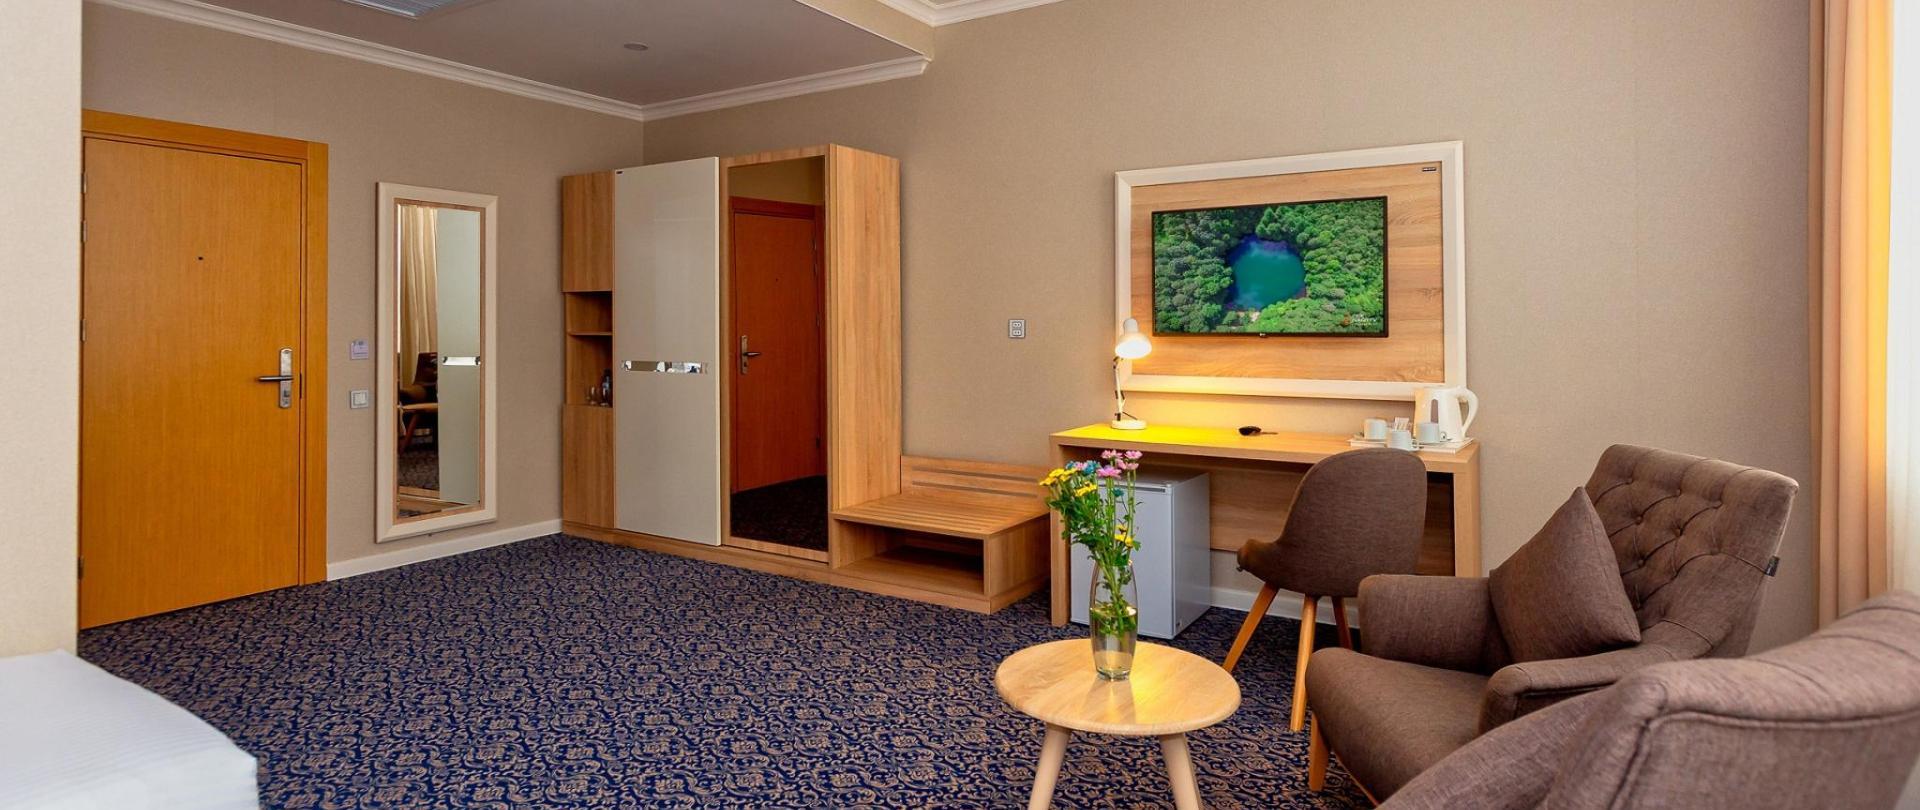 Metrocity Hotel-7.jpg